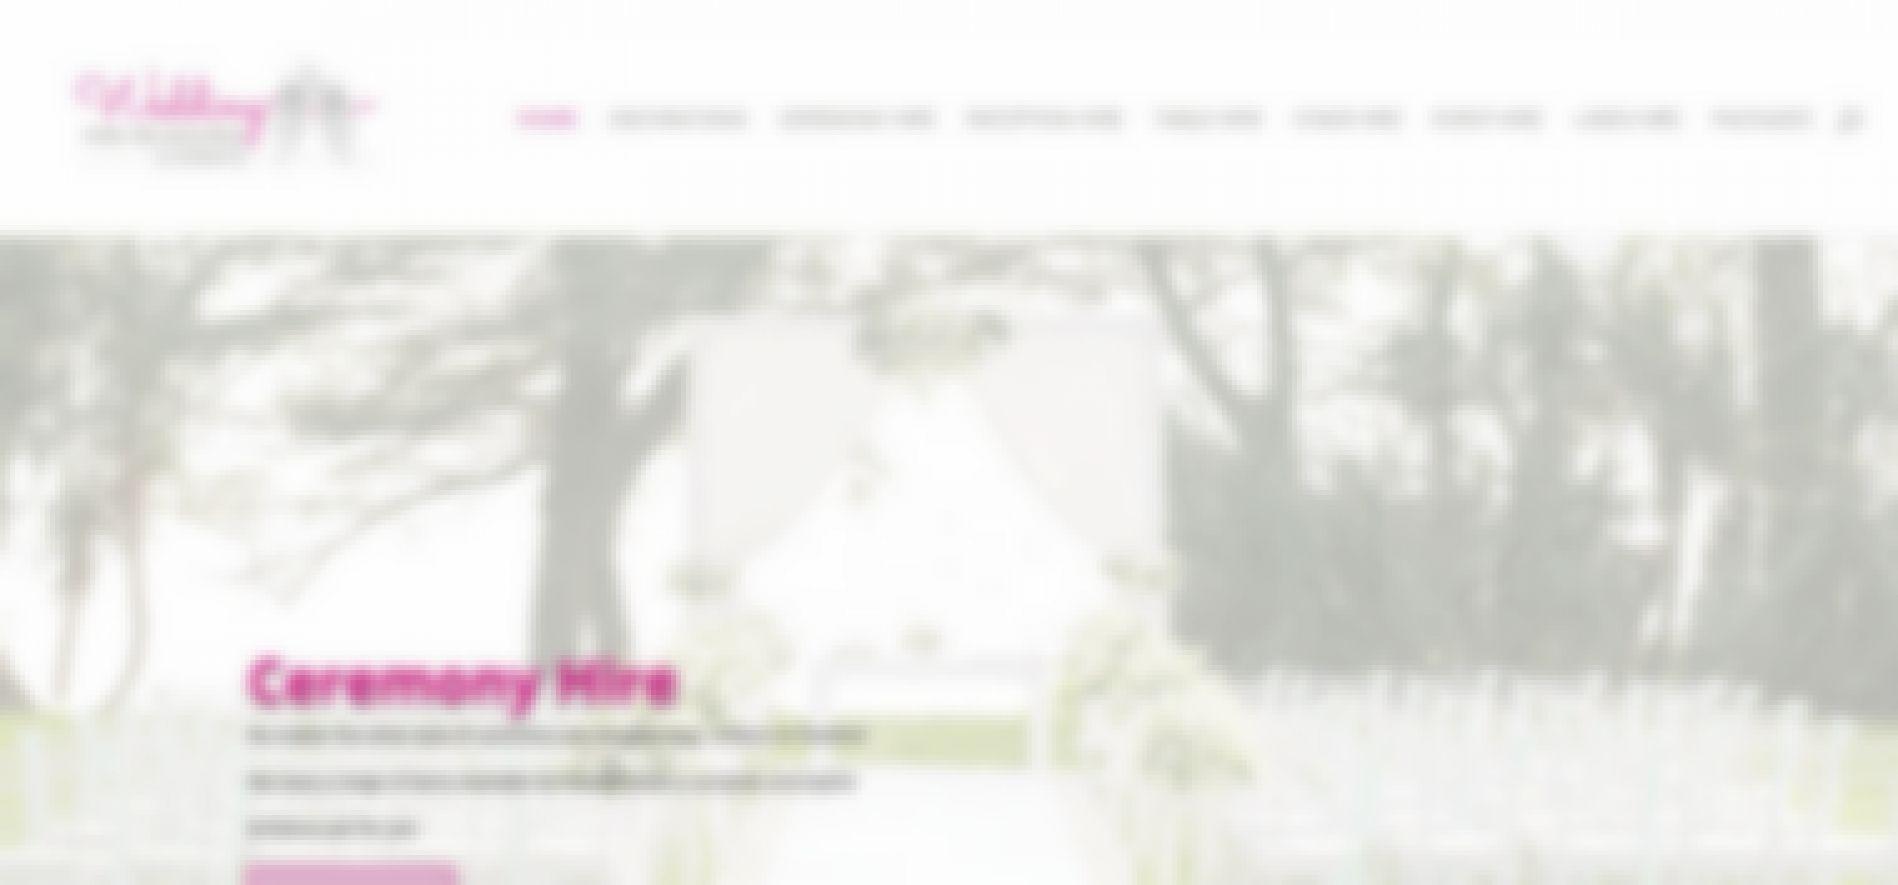 wedding hire melbourne & event